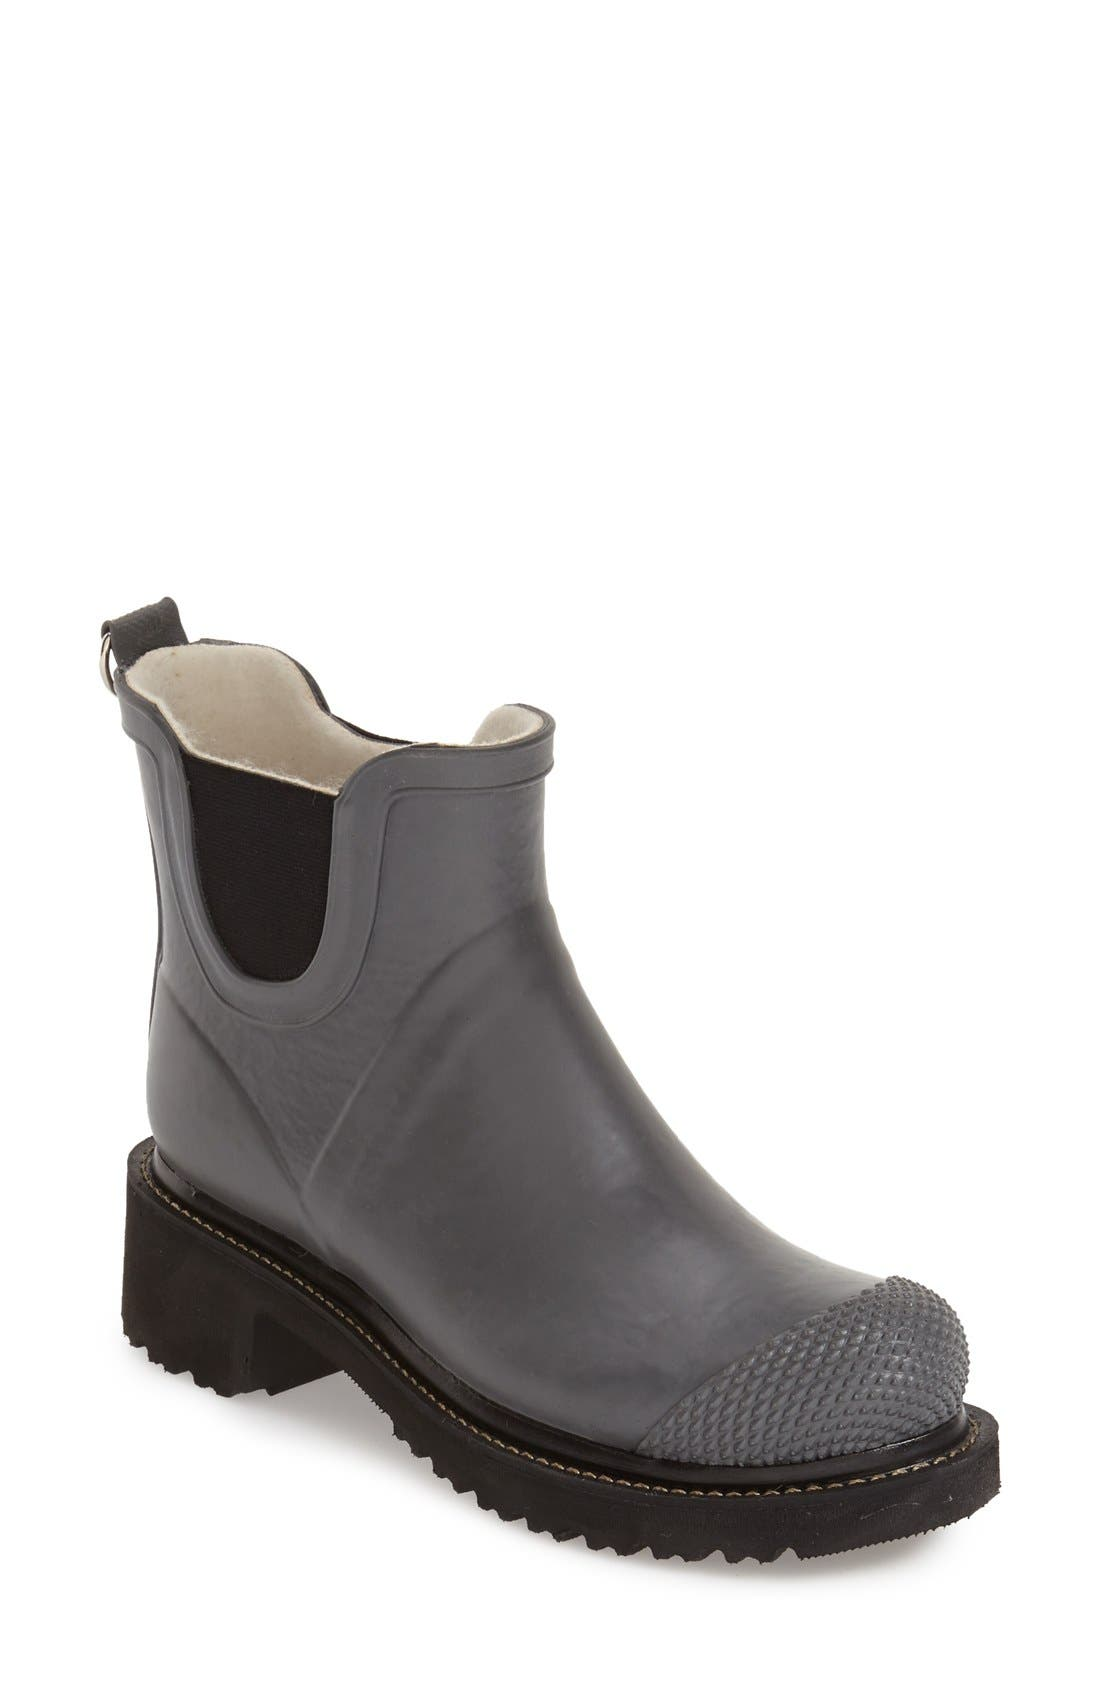 'RUB 47' Short Waterproof Rain Boot,                             Main thumbnail 1, color,                             GREY